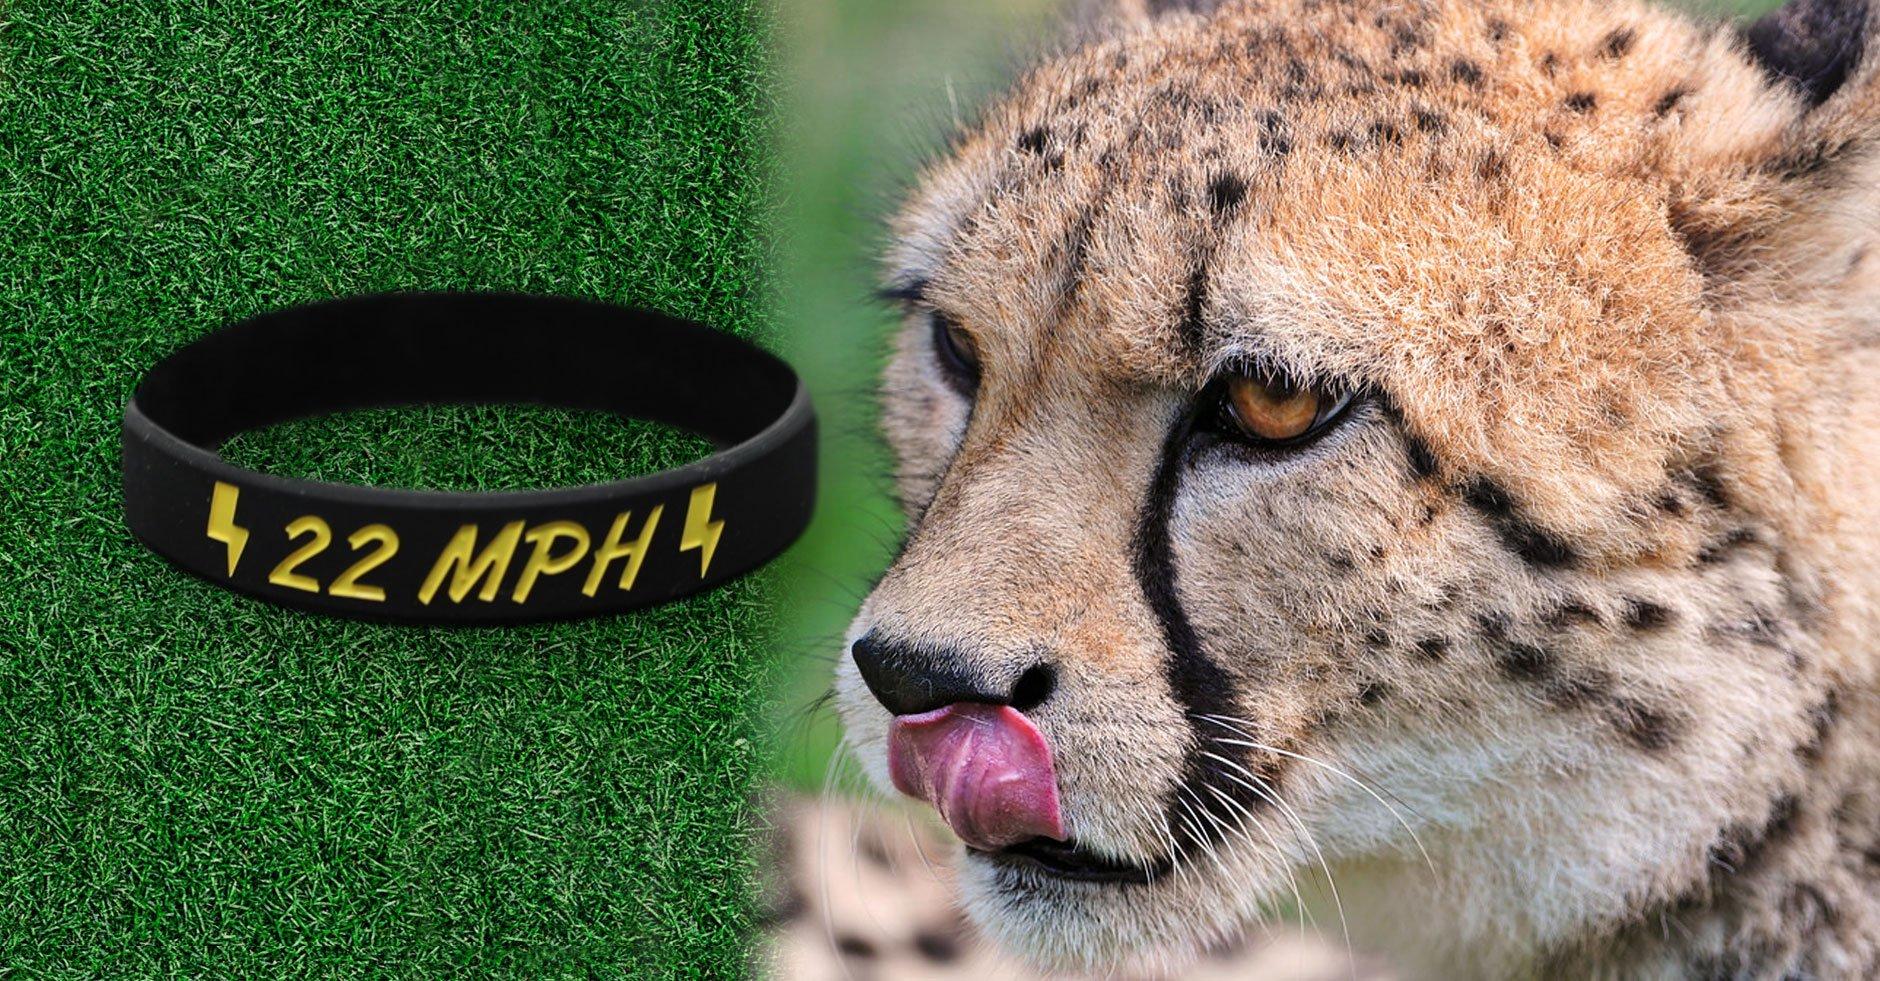 Hungry Cheetah Eyeing MPH Wristband